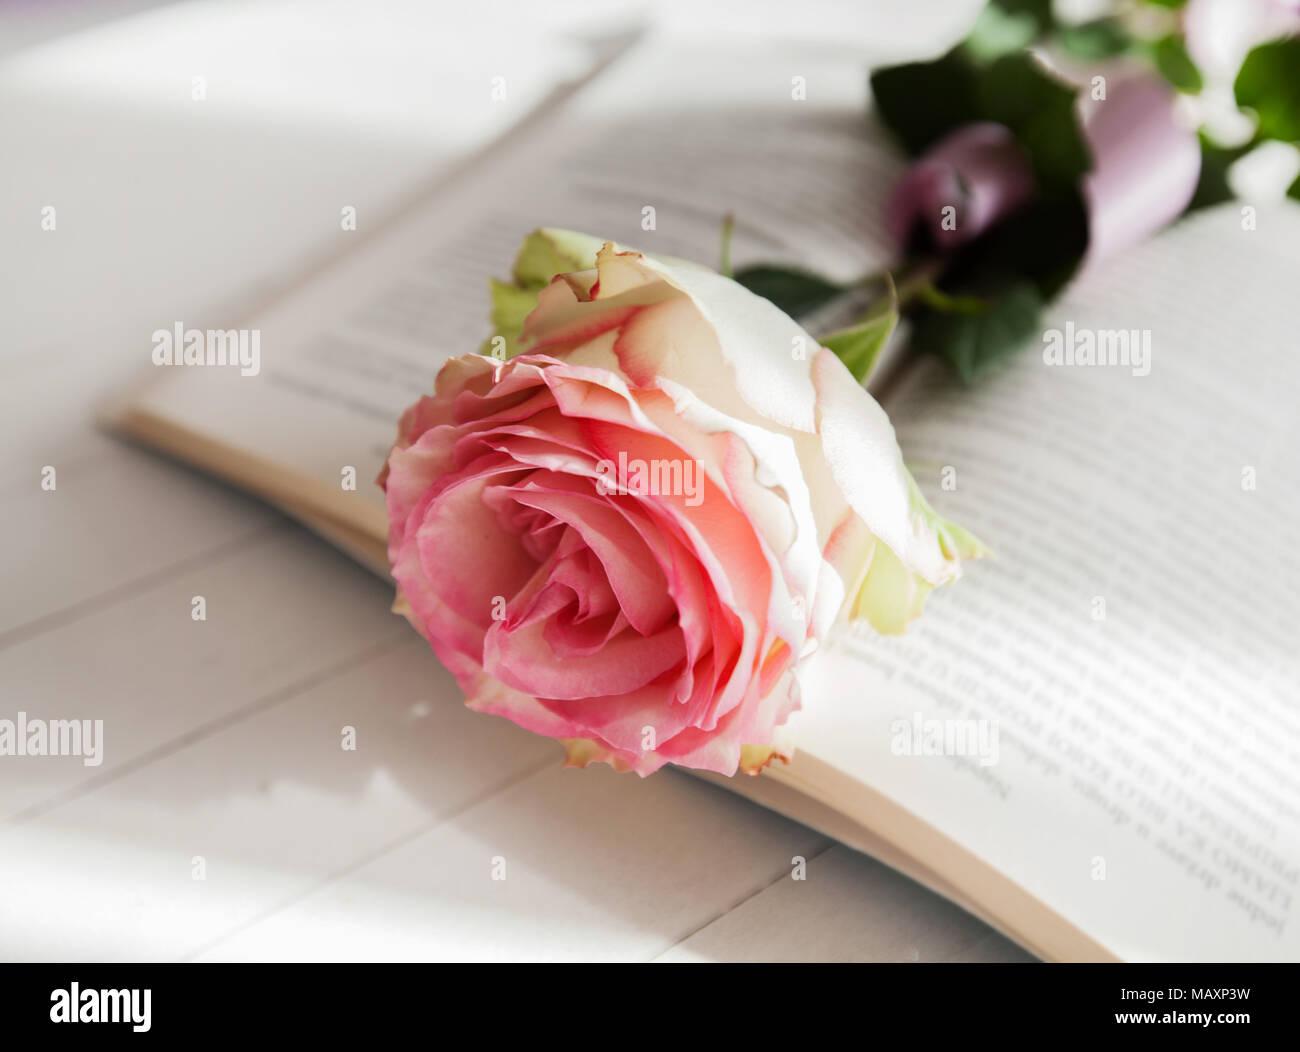 Beautiful rose flower on open book on white wooden background beautiful rose flower on open book on white wooden background romantic and love concept izmirmasajfo